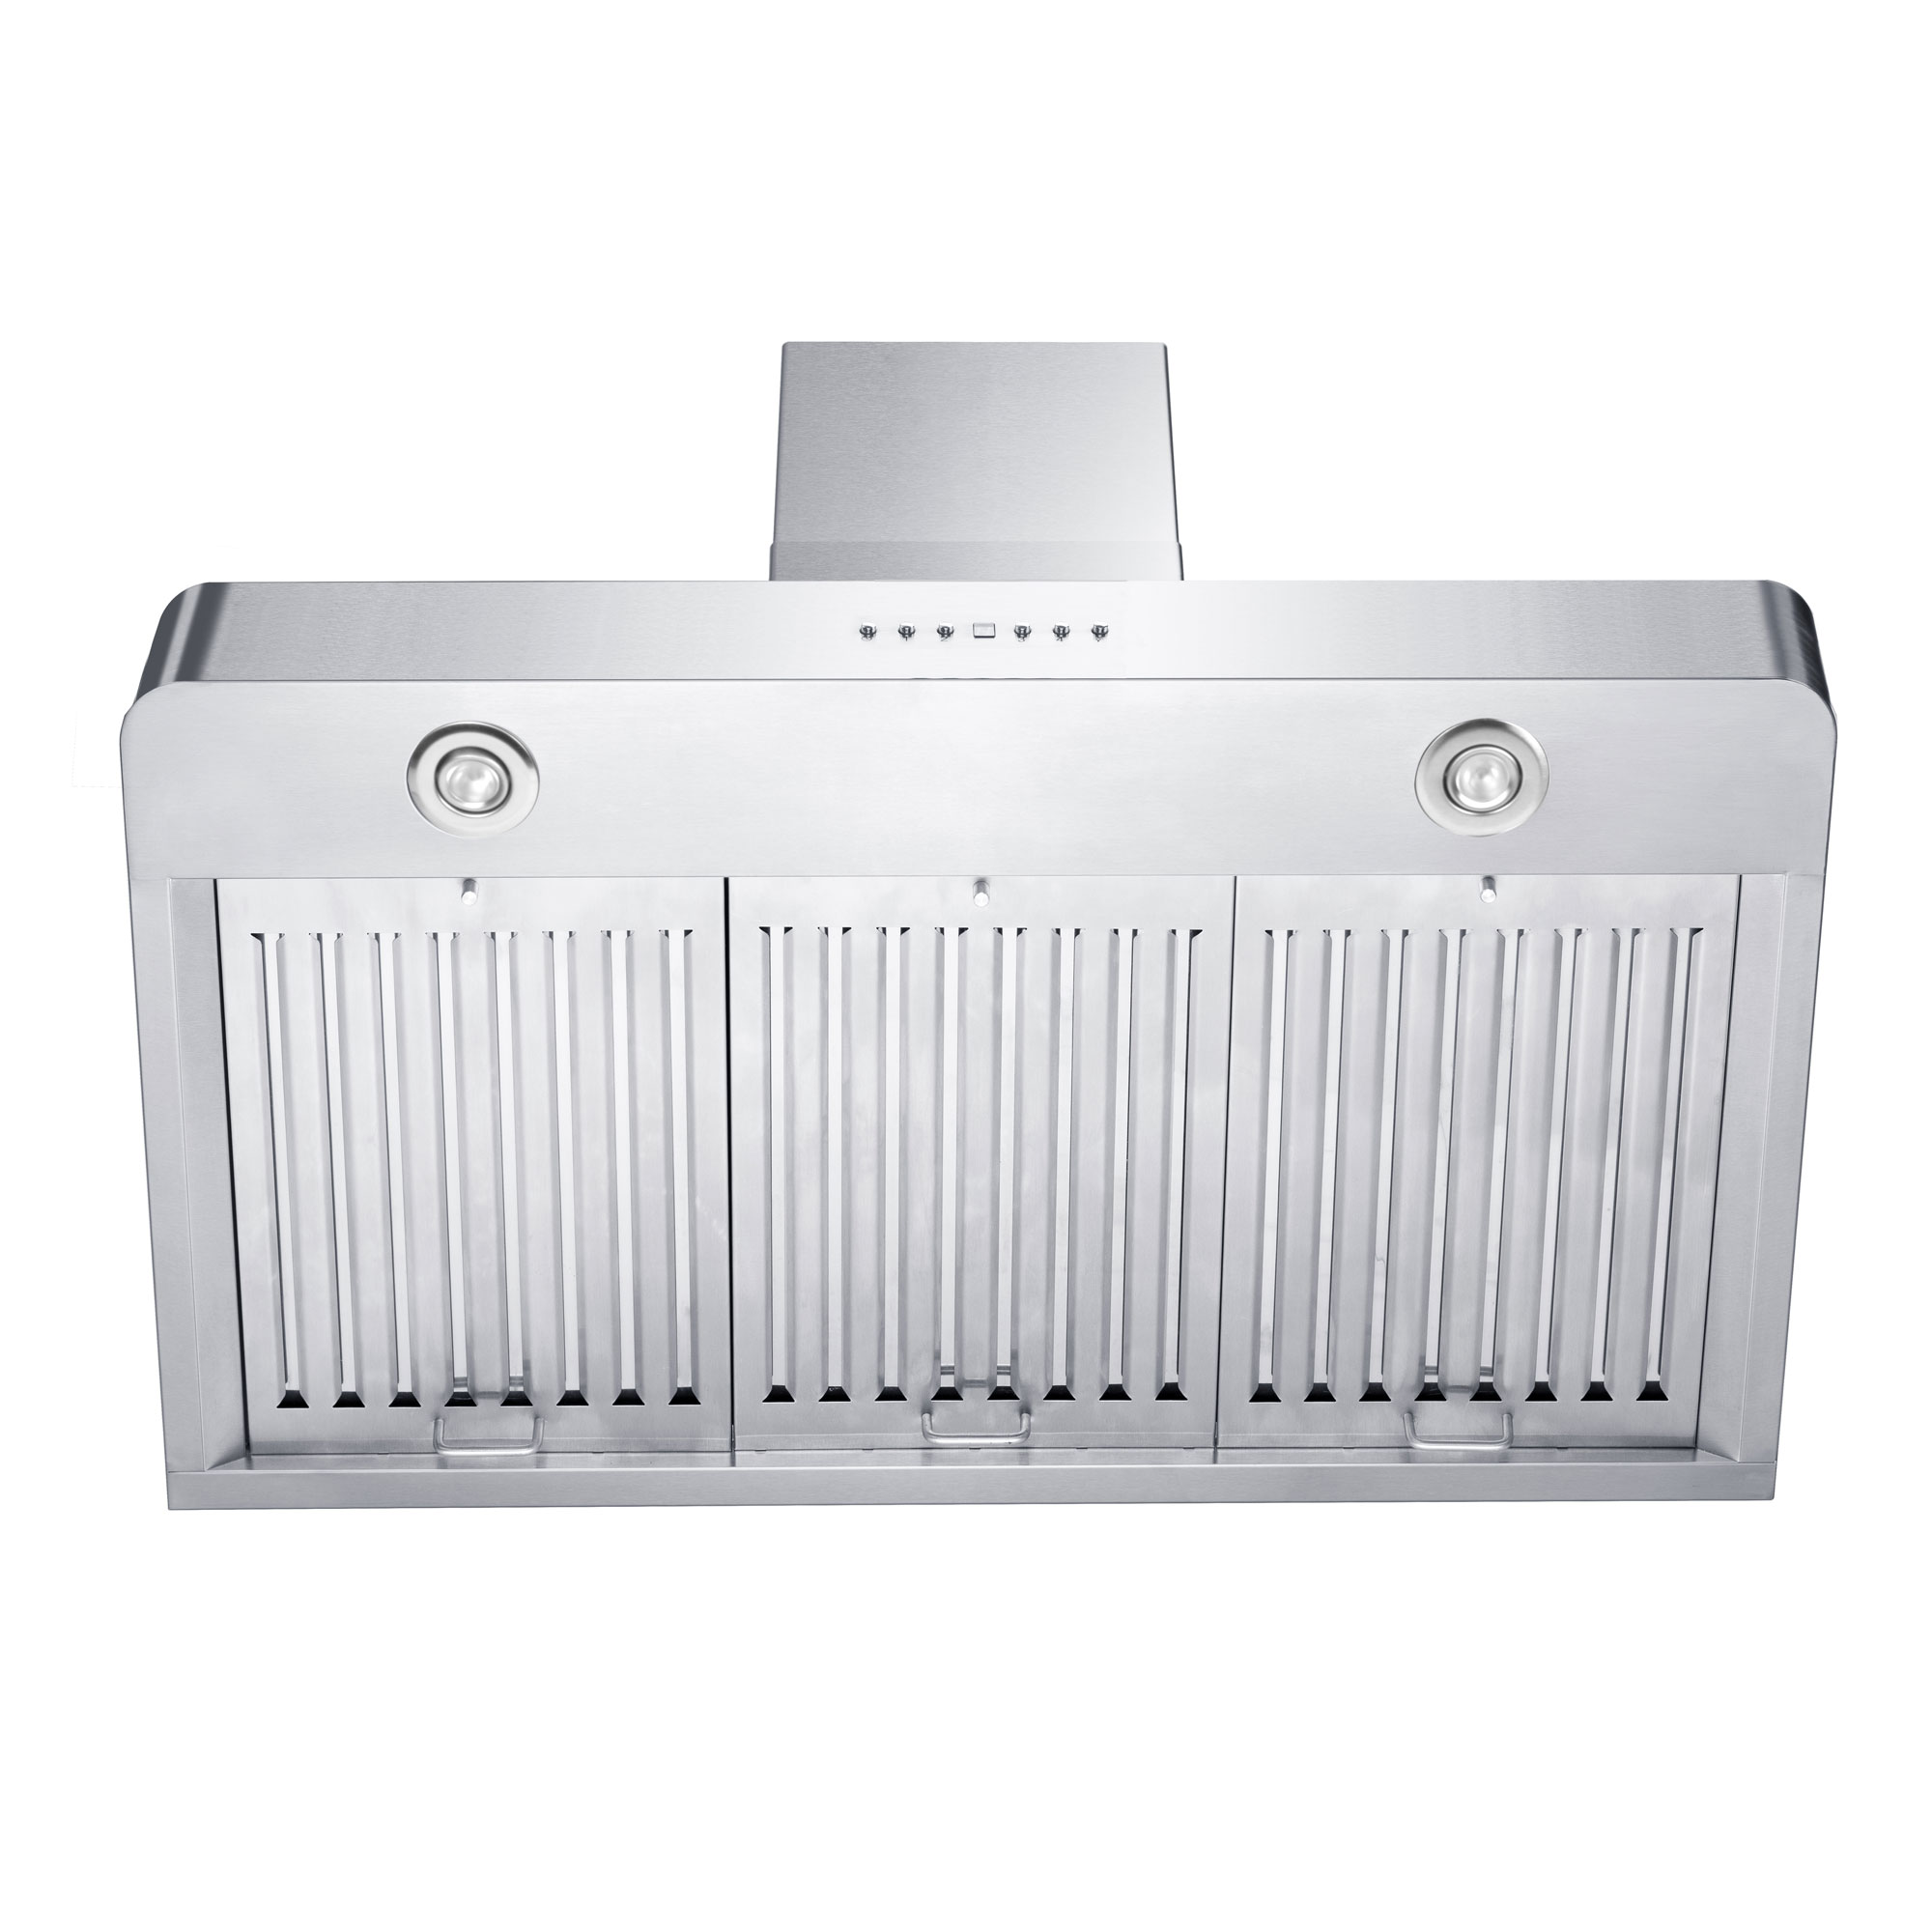 zline-stainless-steel-wall-mounted-range-hood-kf2-new-bottom.jpg